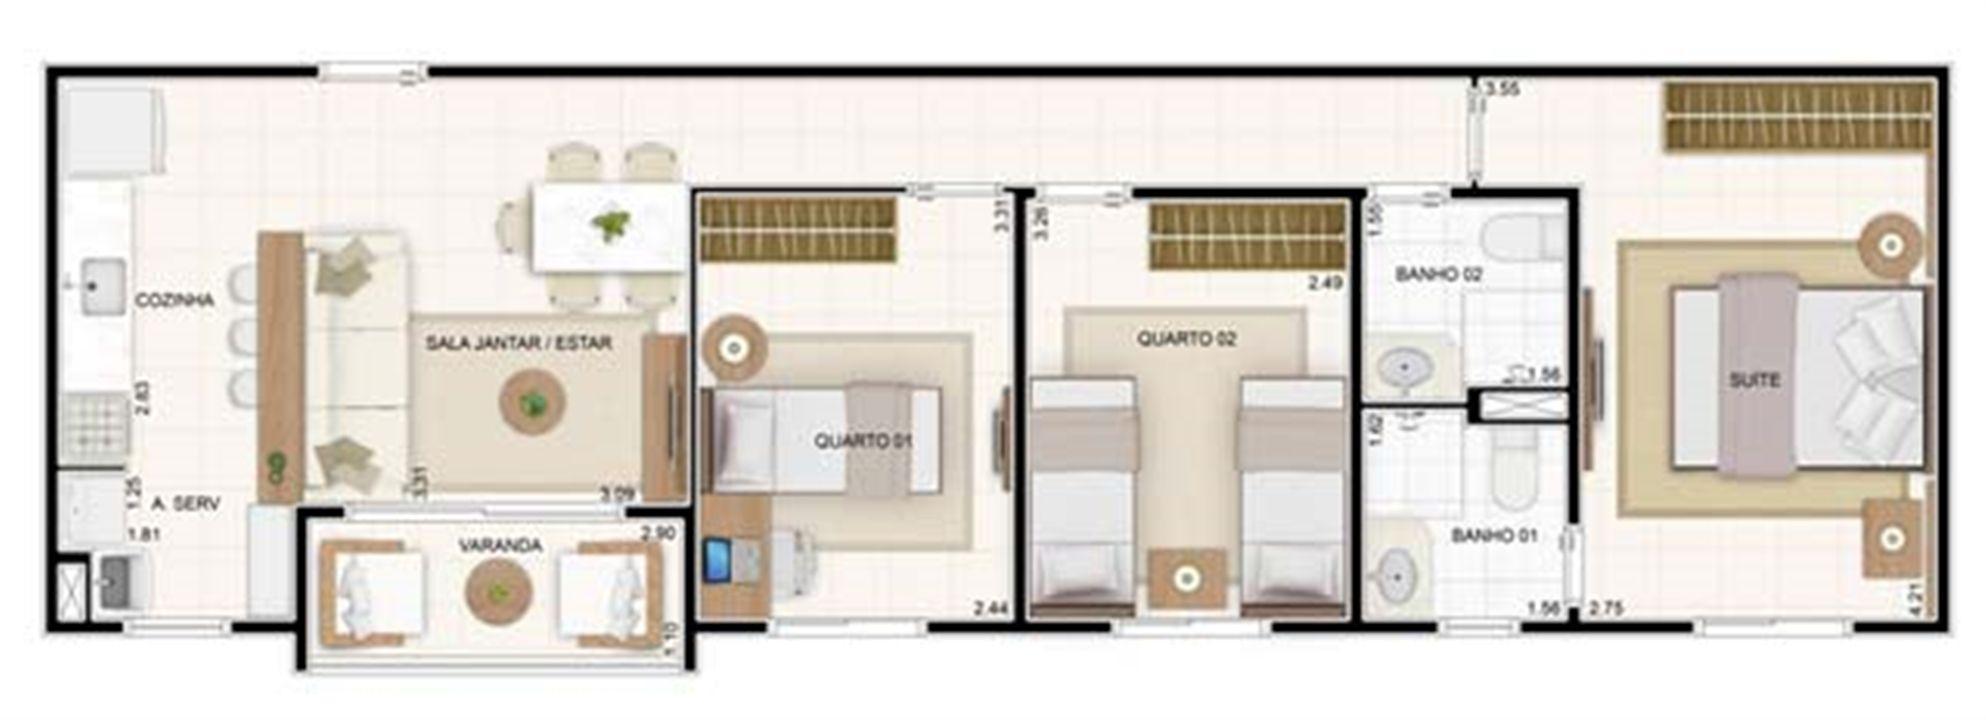 3 dorms 67,35m² | Vita 2 Residencial Clube – Apartamentono  Pitimbu - Natal - Rio Grande do Norte